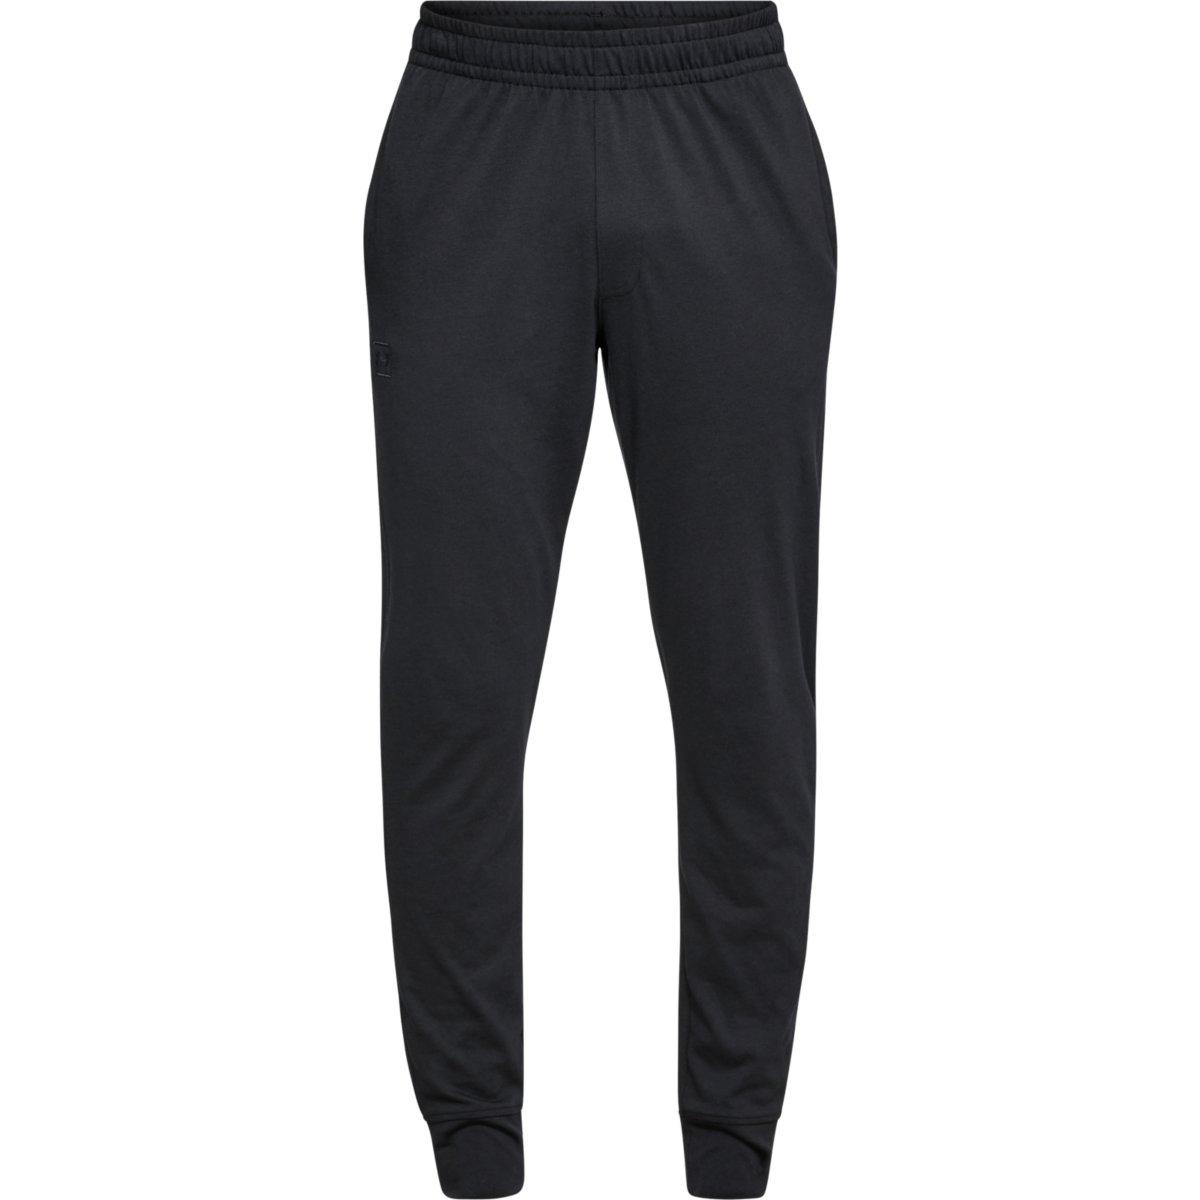 Under Armour Men's Ua Rival Jogger Pants - Black, L